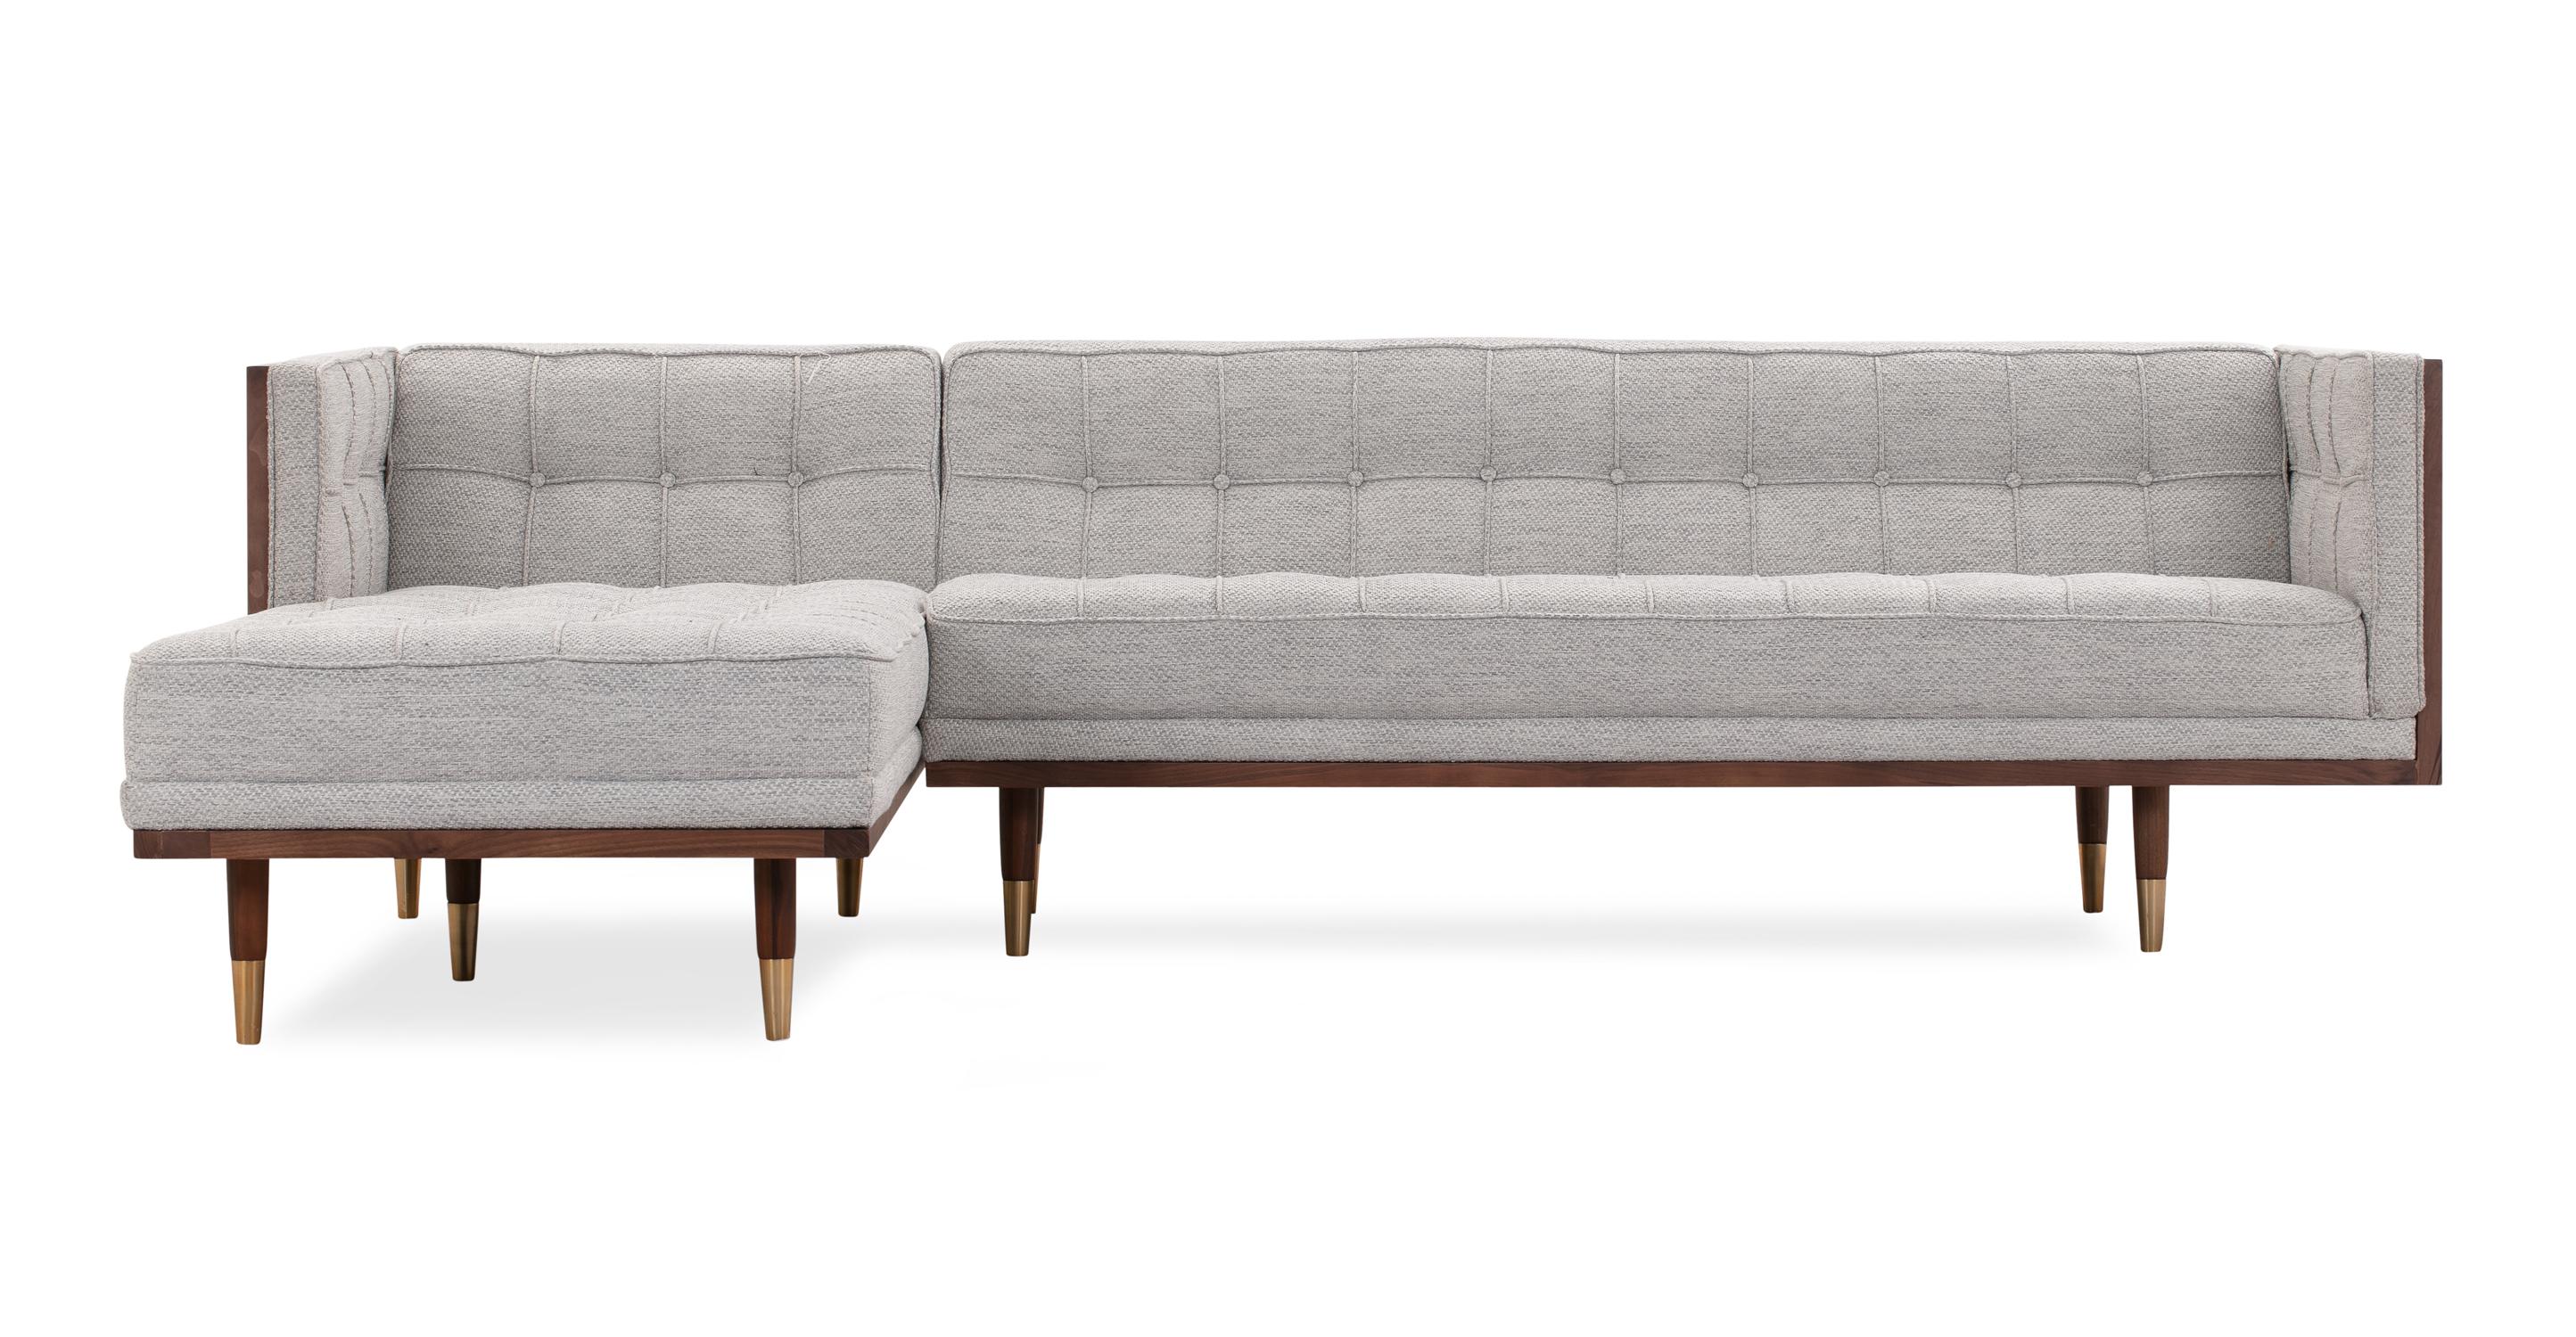 "Woodrow Box 100"" Fabric Sofa Sectional Left, Walnut/Neutra"